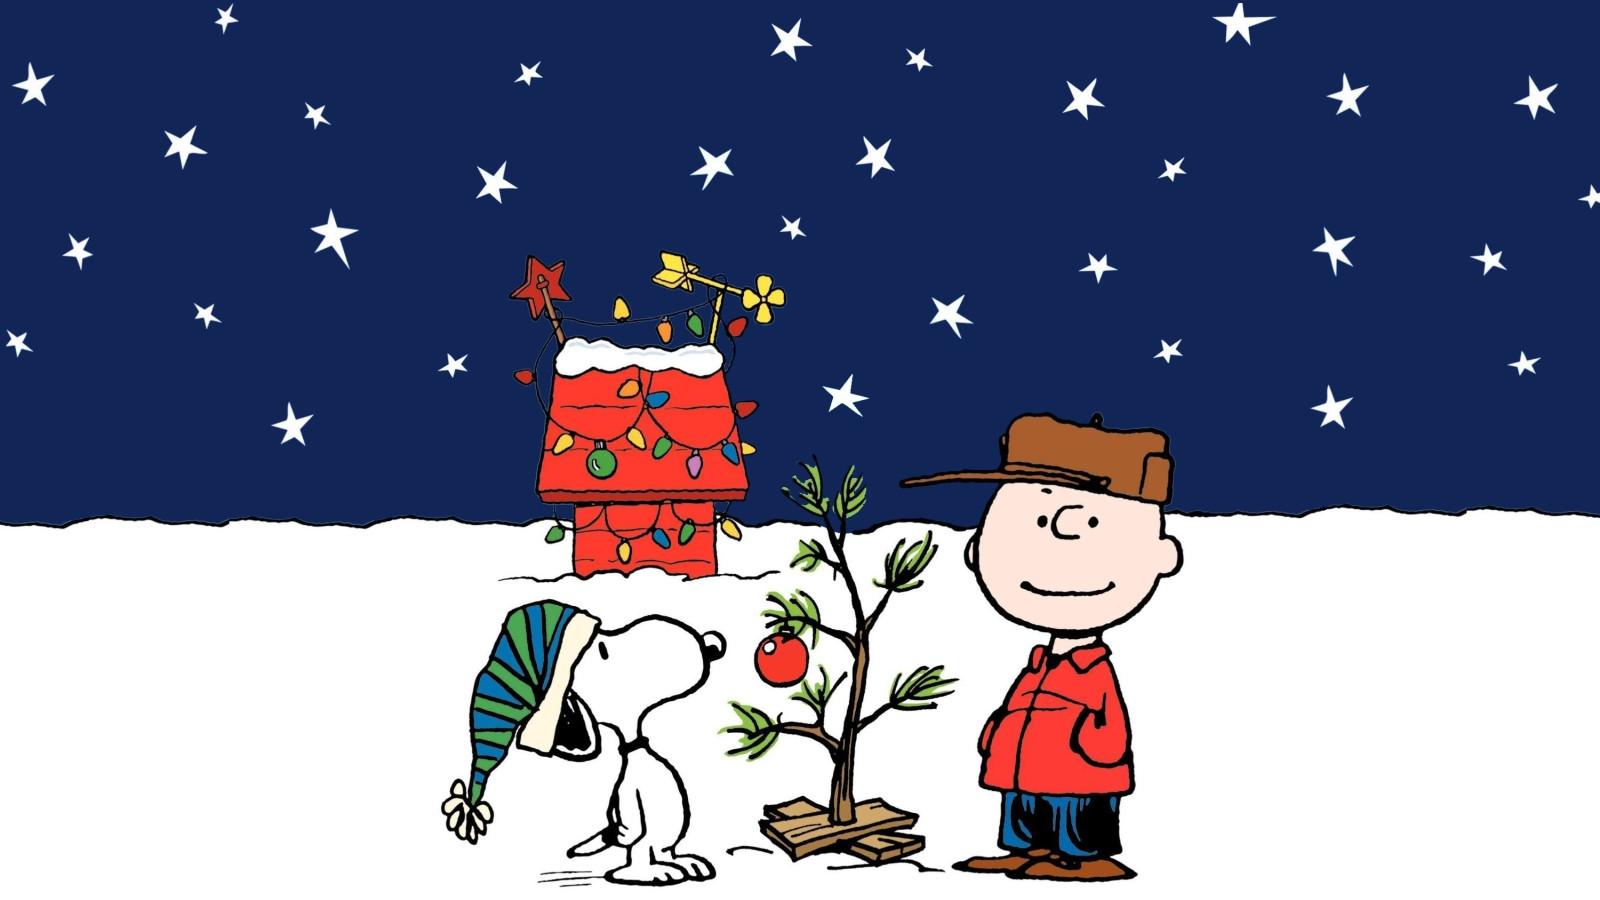 Snoopy christmas desktop clipart.